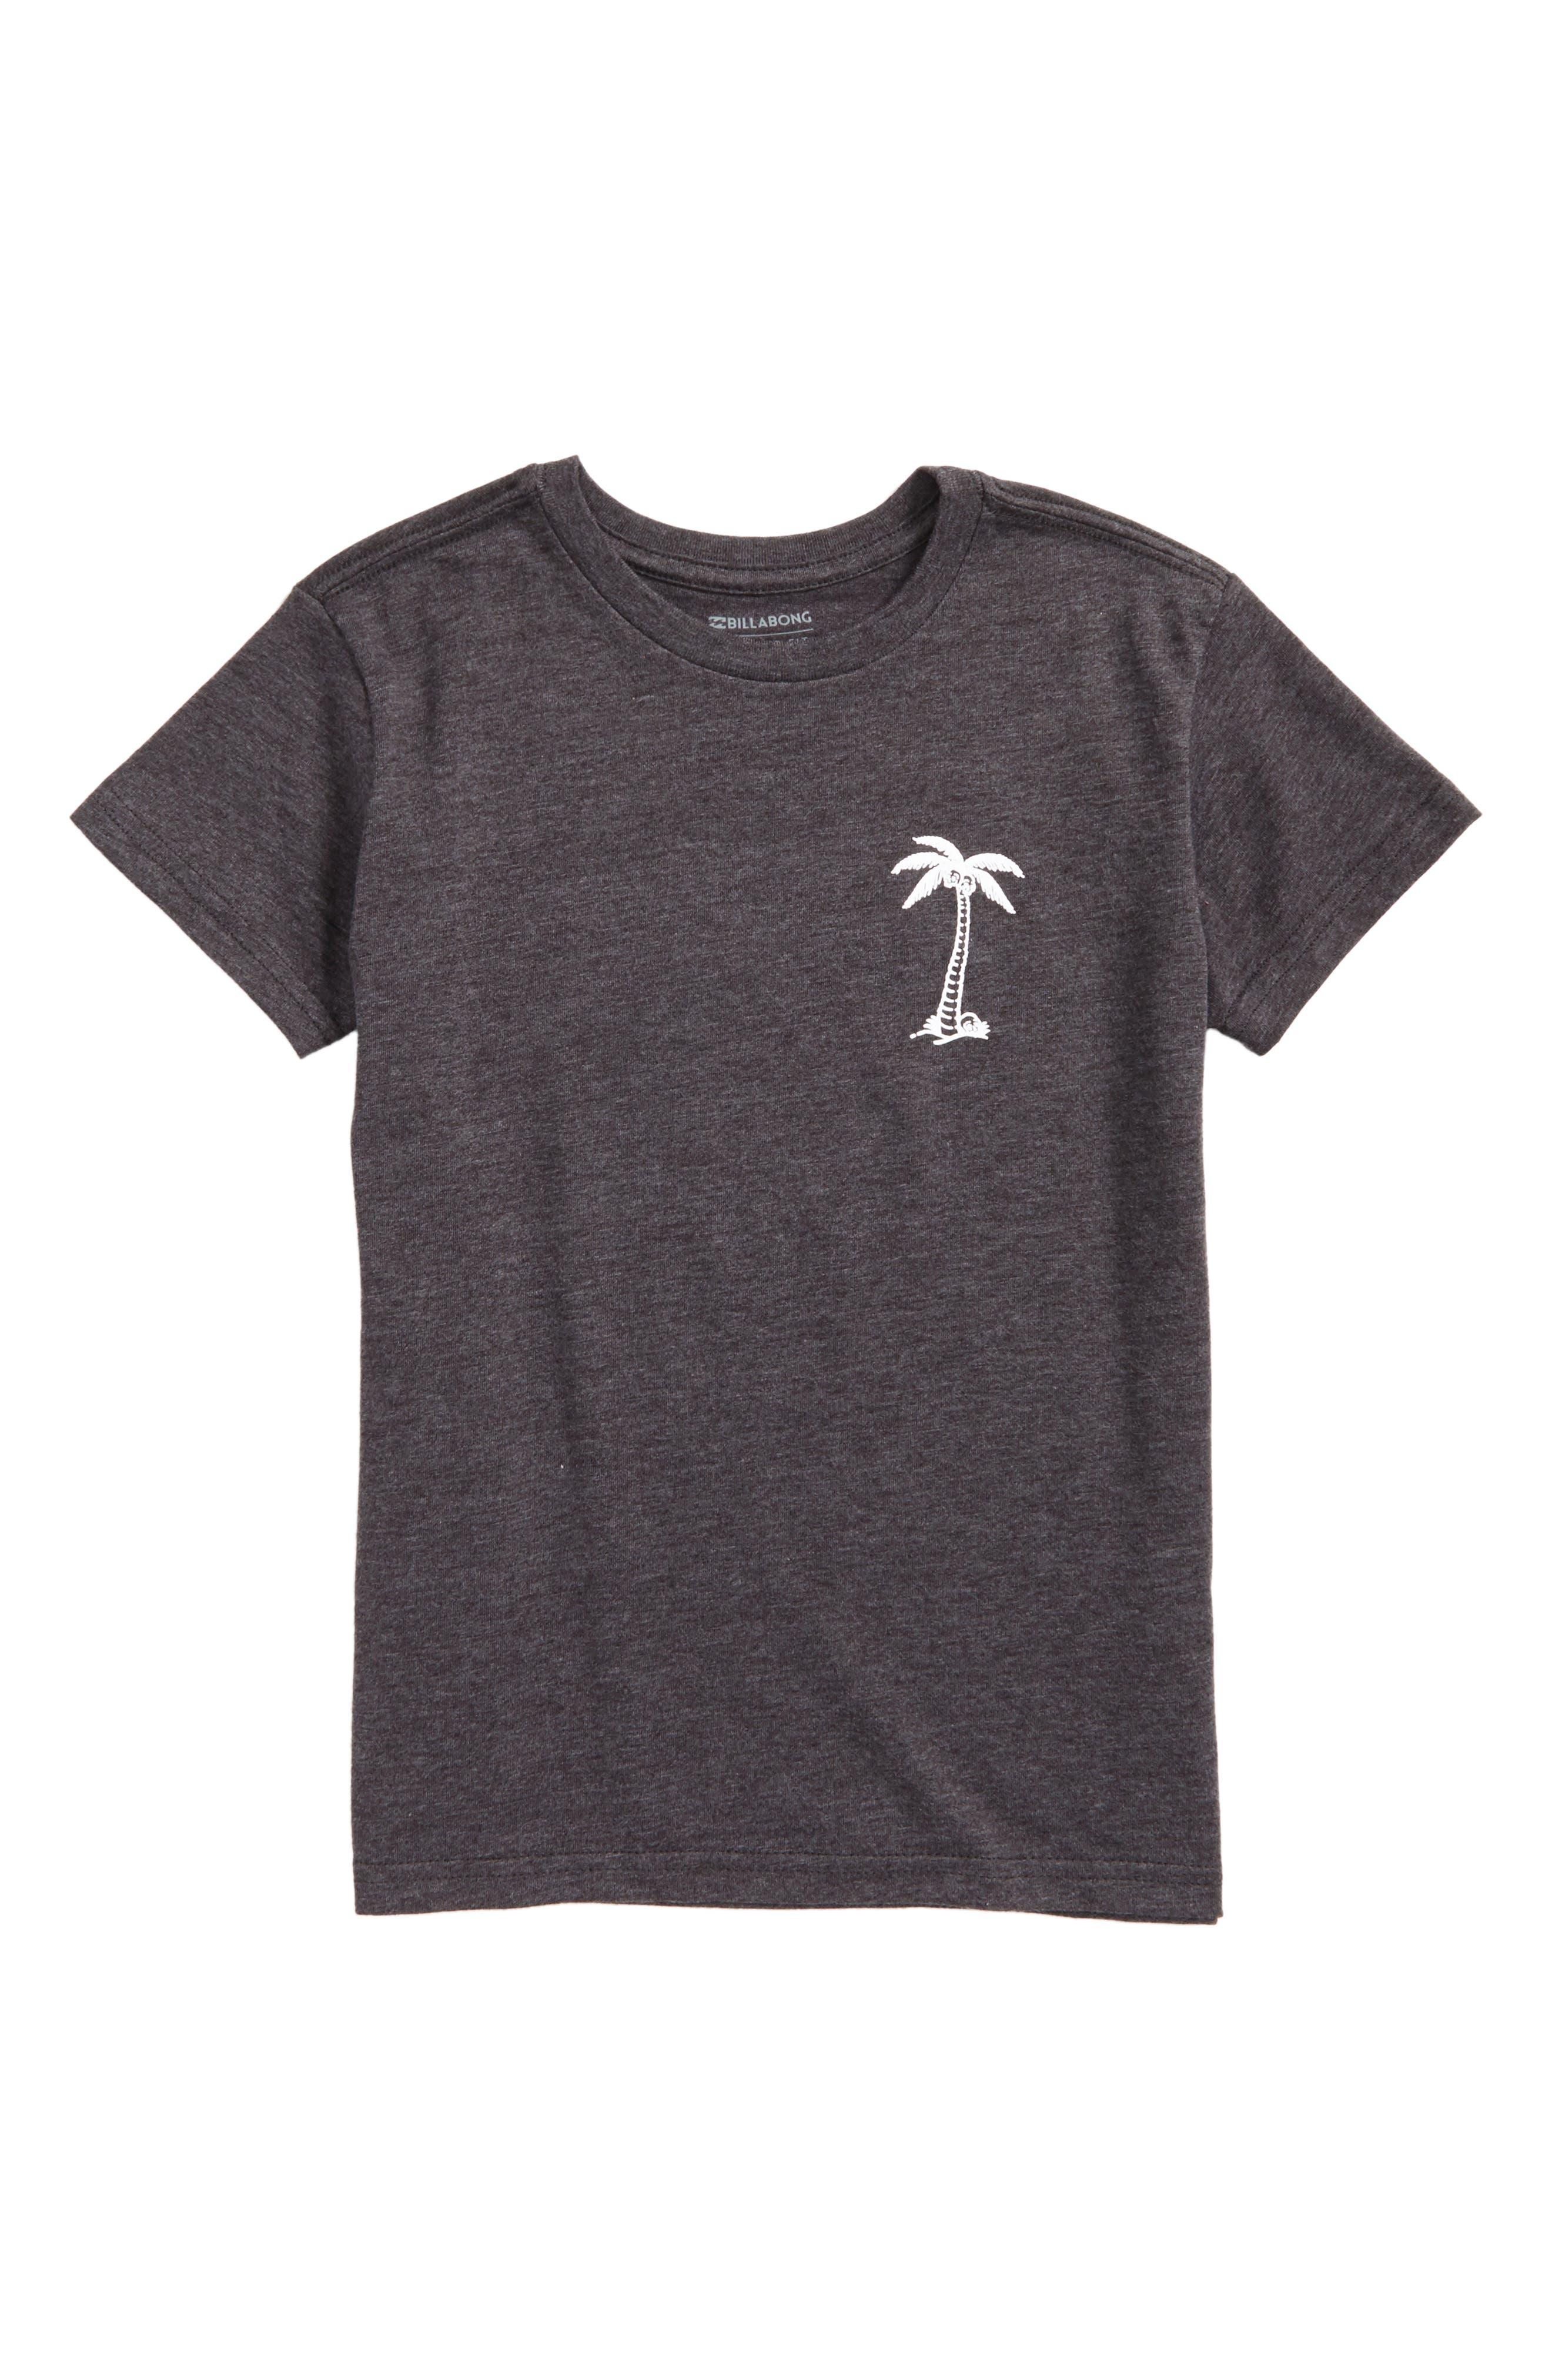 BBTV Palm Tree Graphic T-Shirt,                             Main thumbnail 1, color,                             002